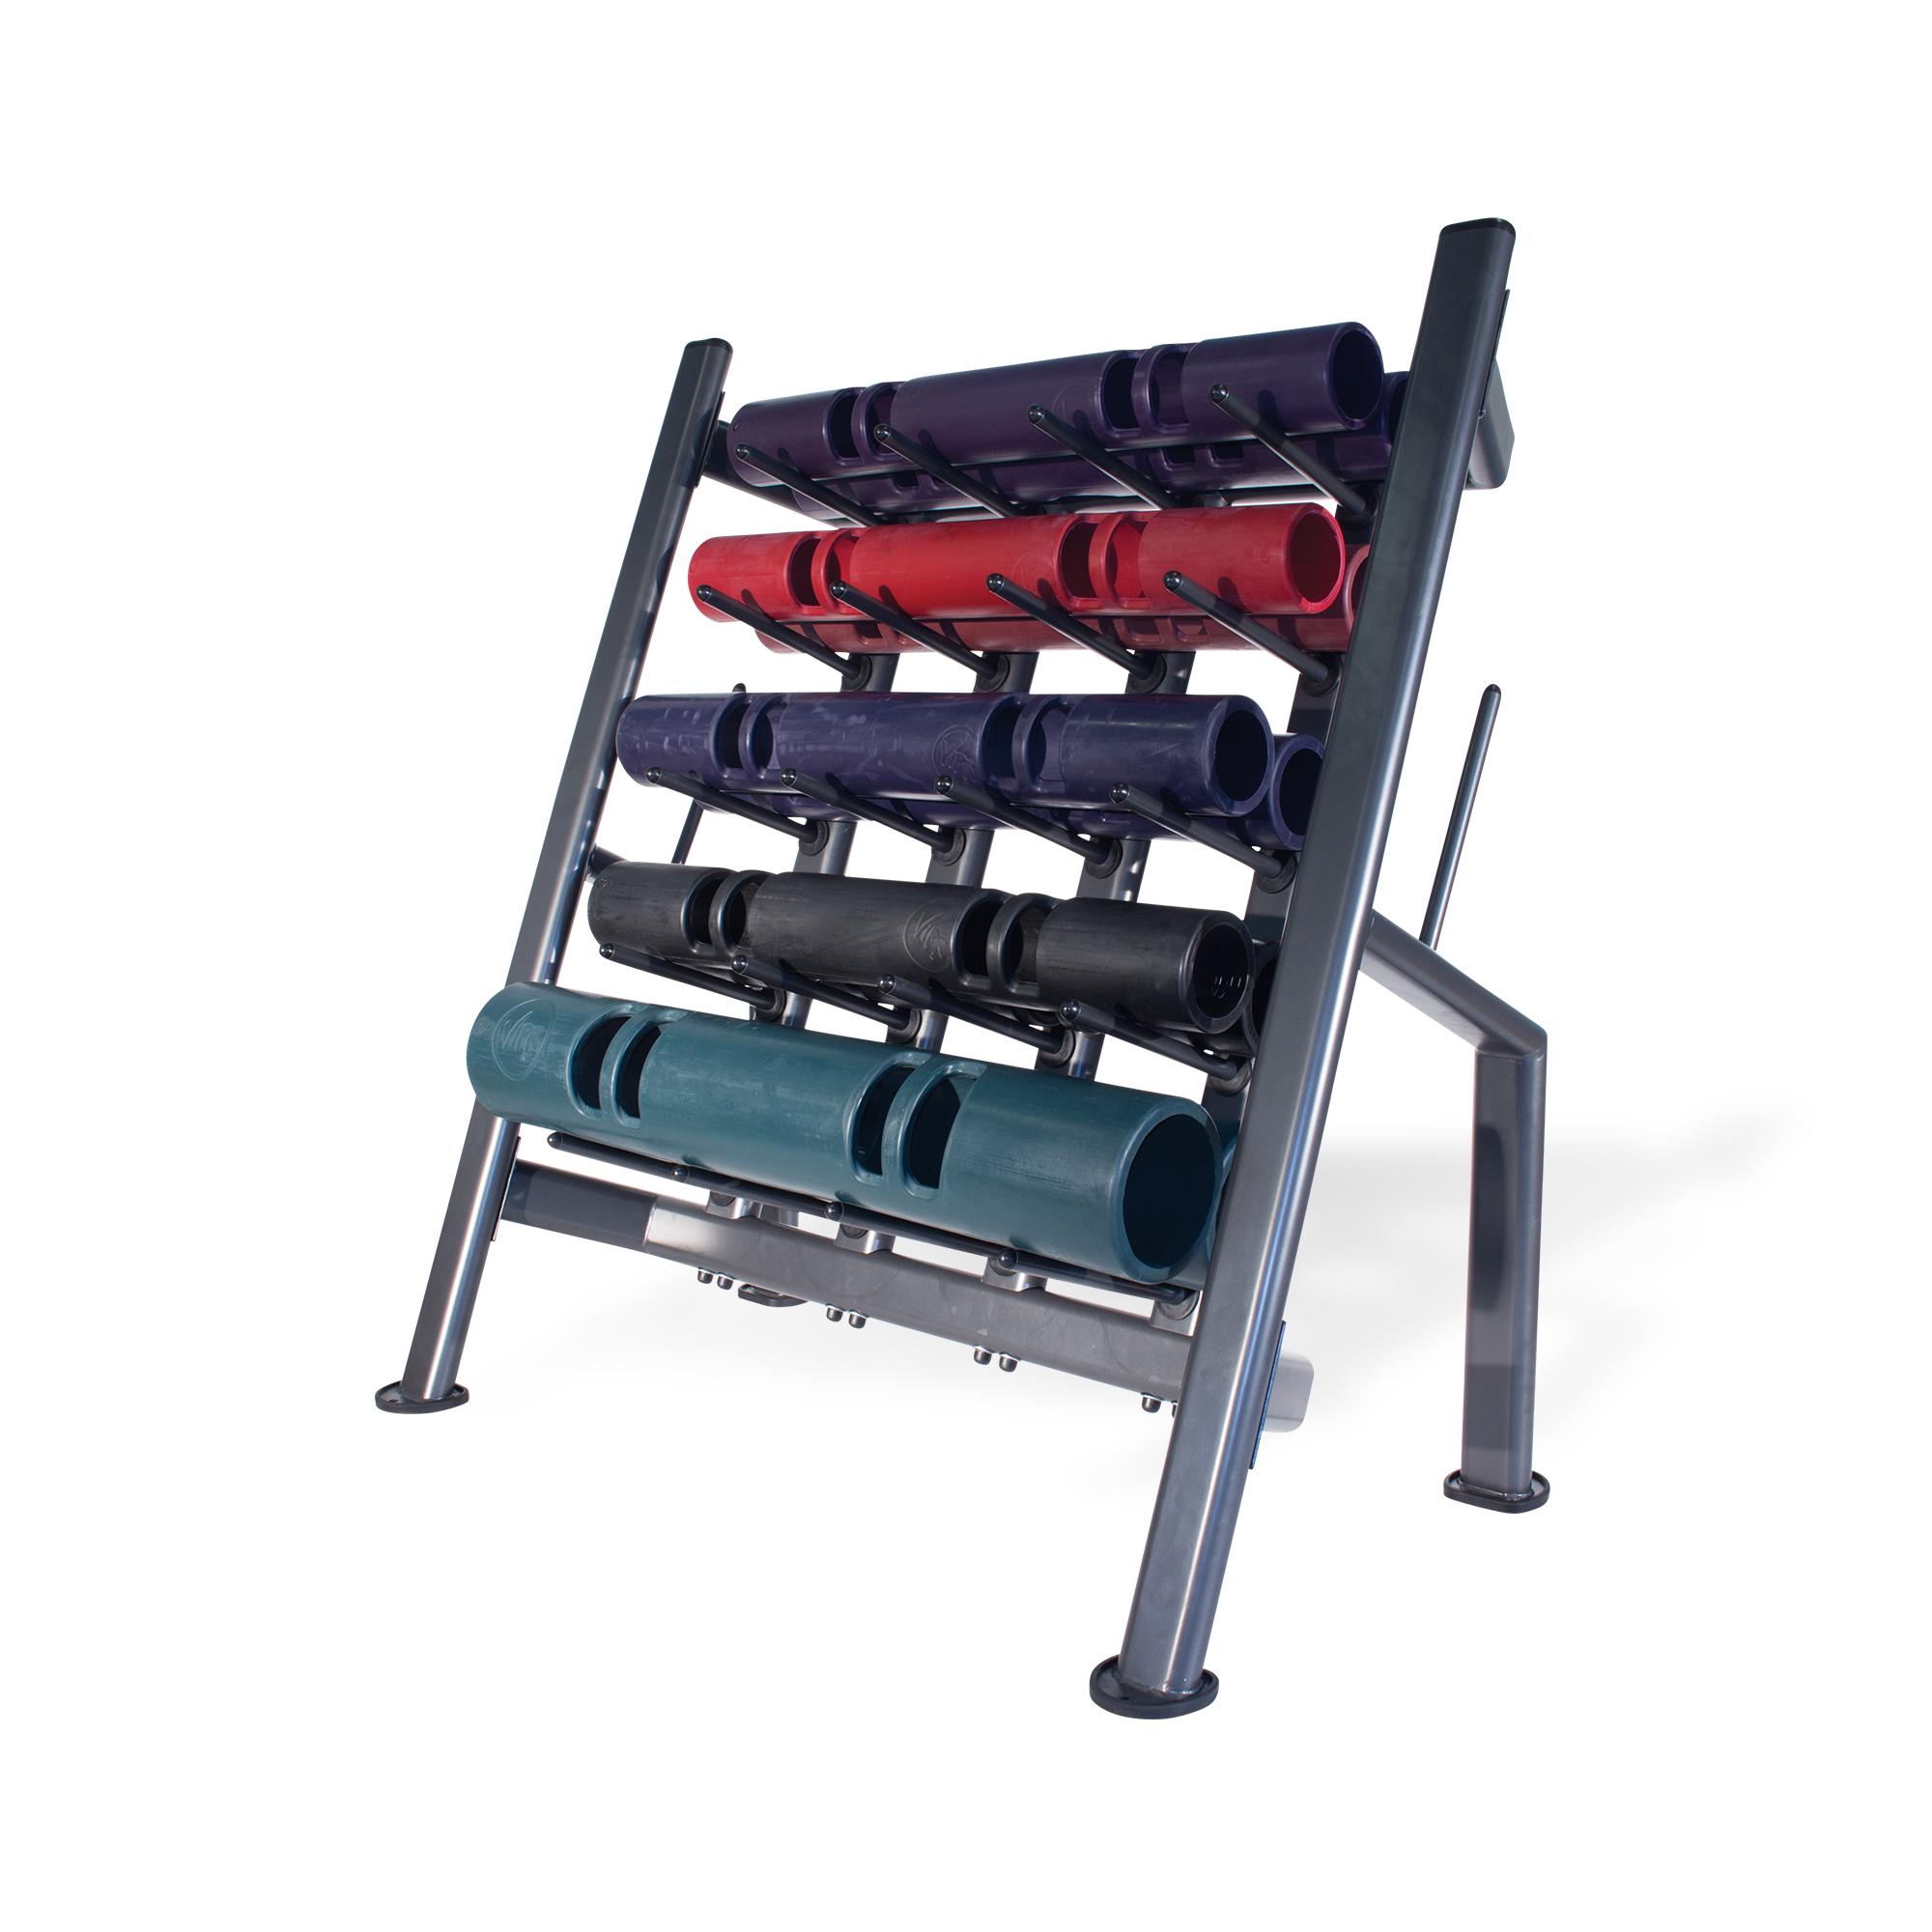 12 Viprs With Vipr Studio Rack Inc 20kg Vipr Buy